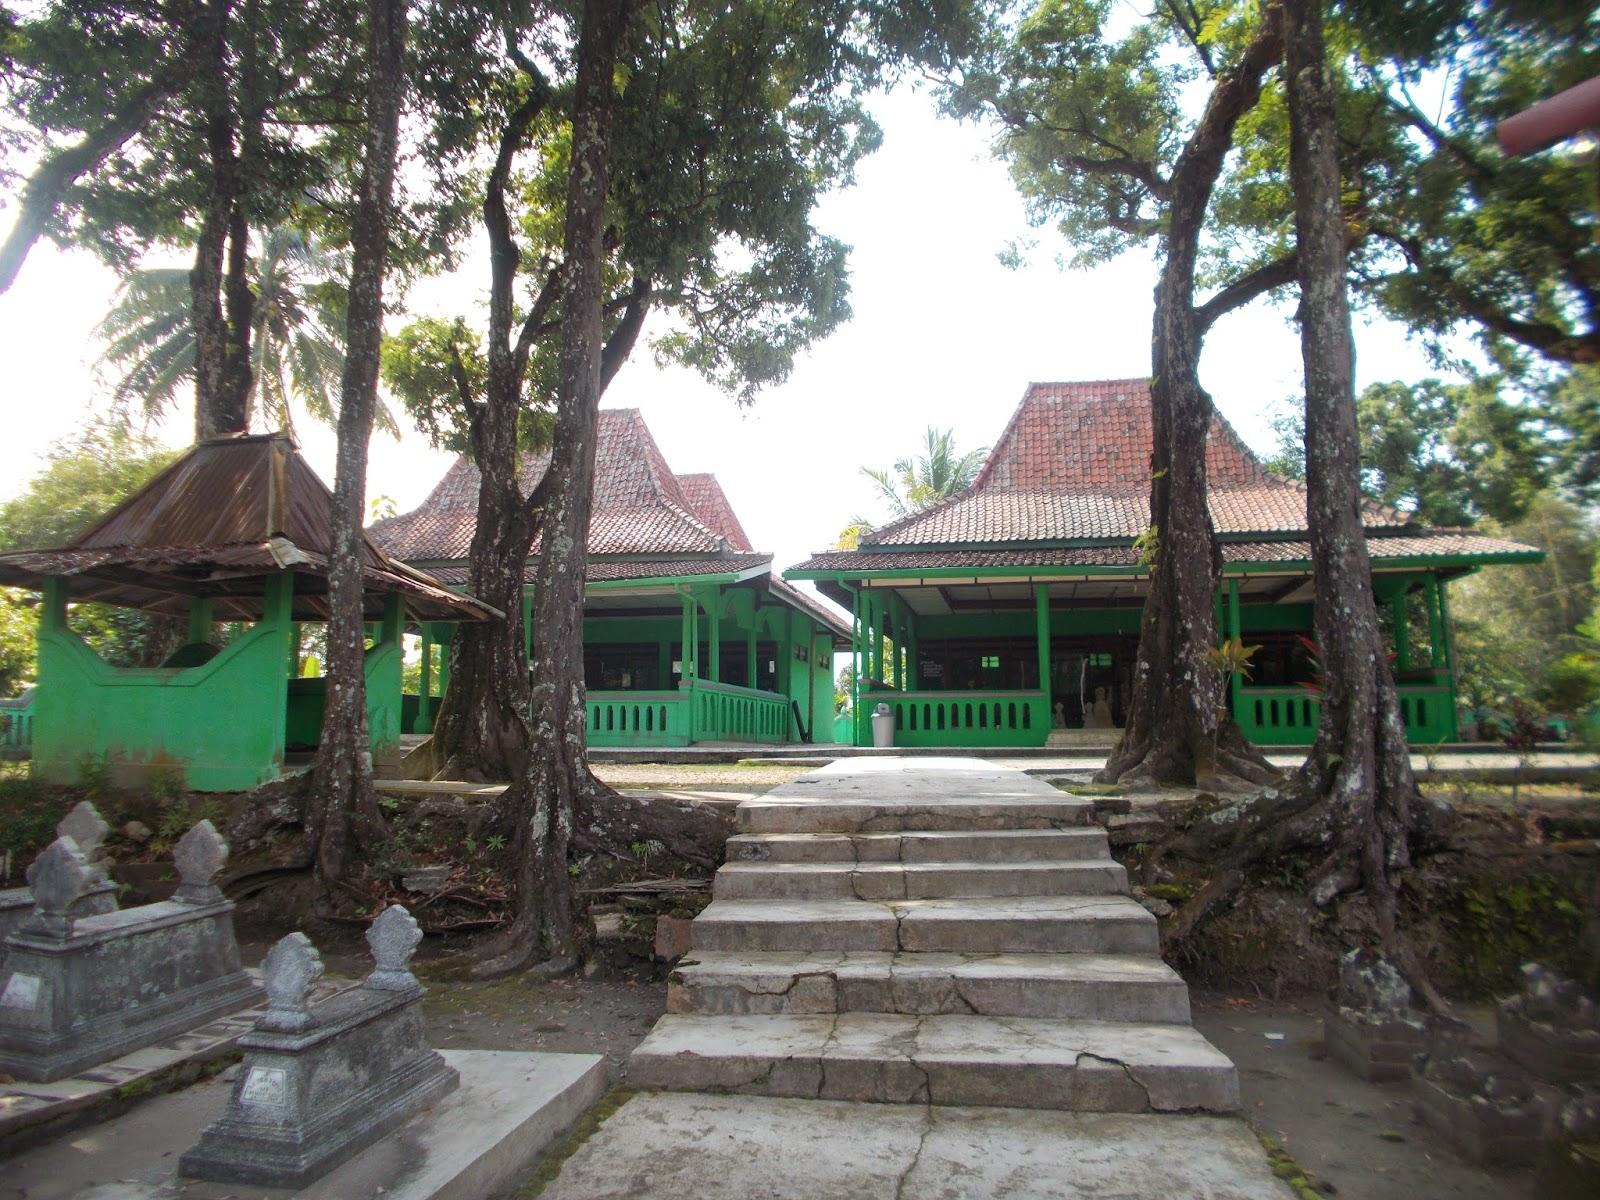 Wisata Kulonprogo Makam Nyi Ageng Serang